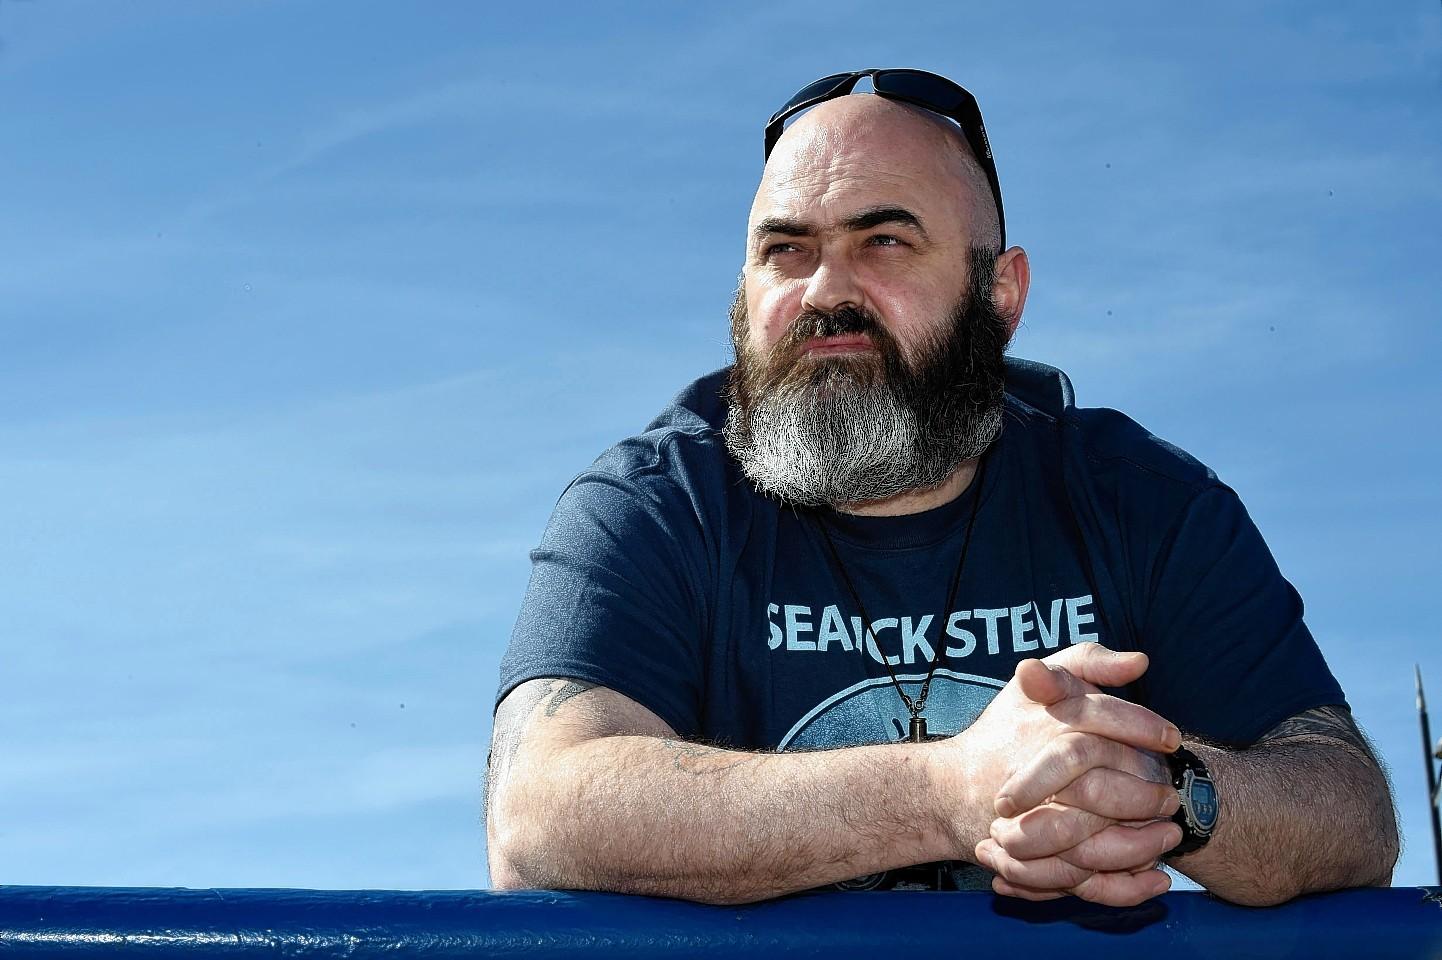 Shaun's dad, Charlie Reid